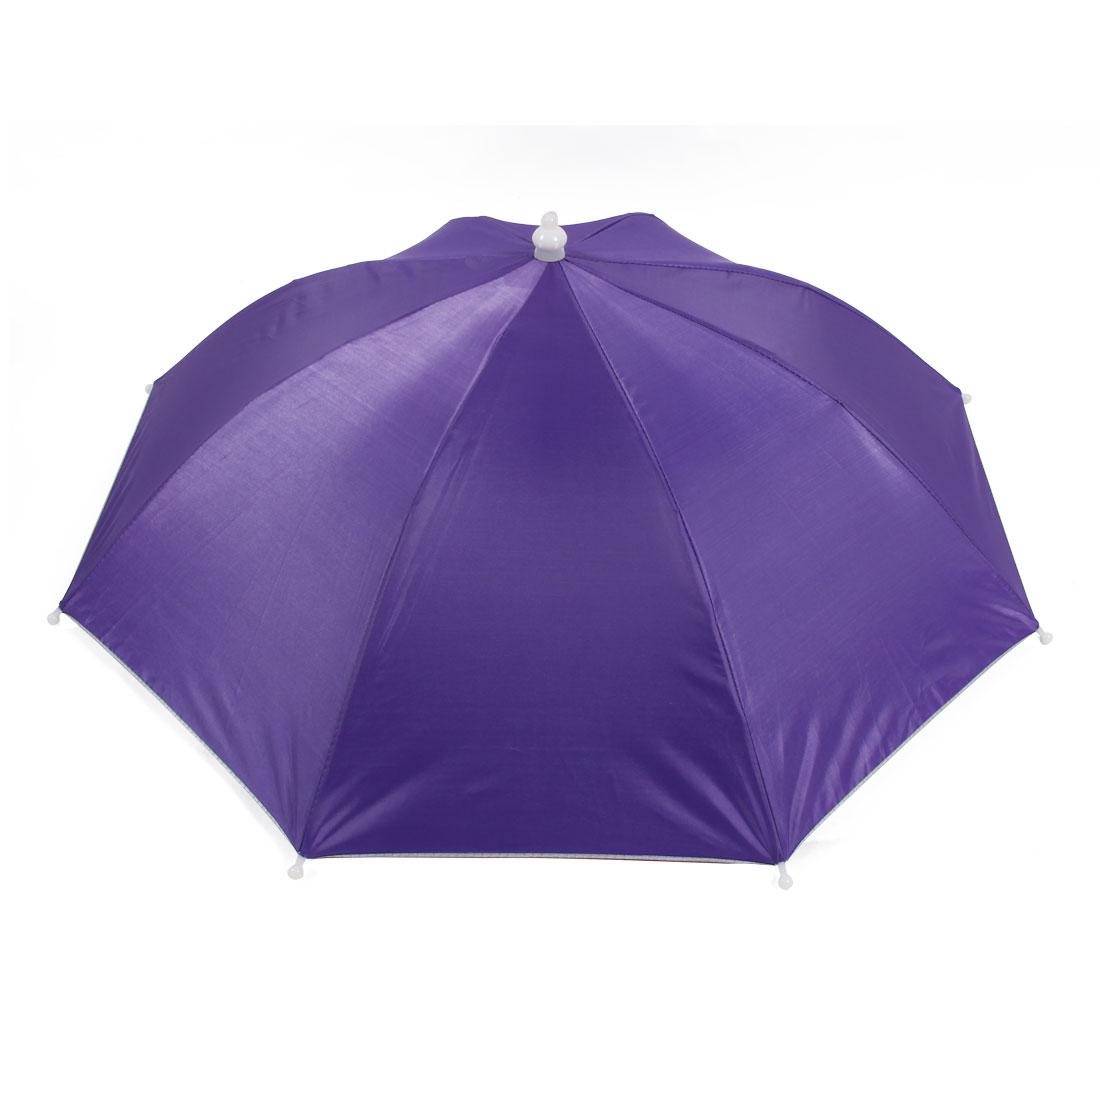 Fishing Camping Hands Free Purple Umbrella Hat Cap